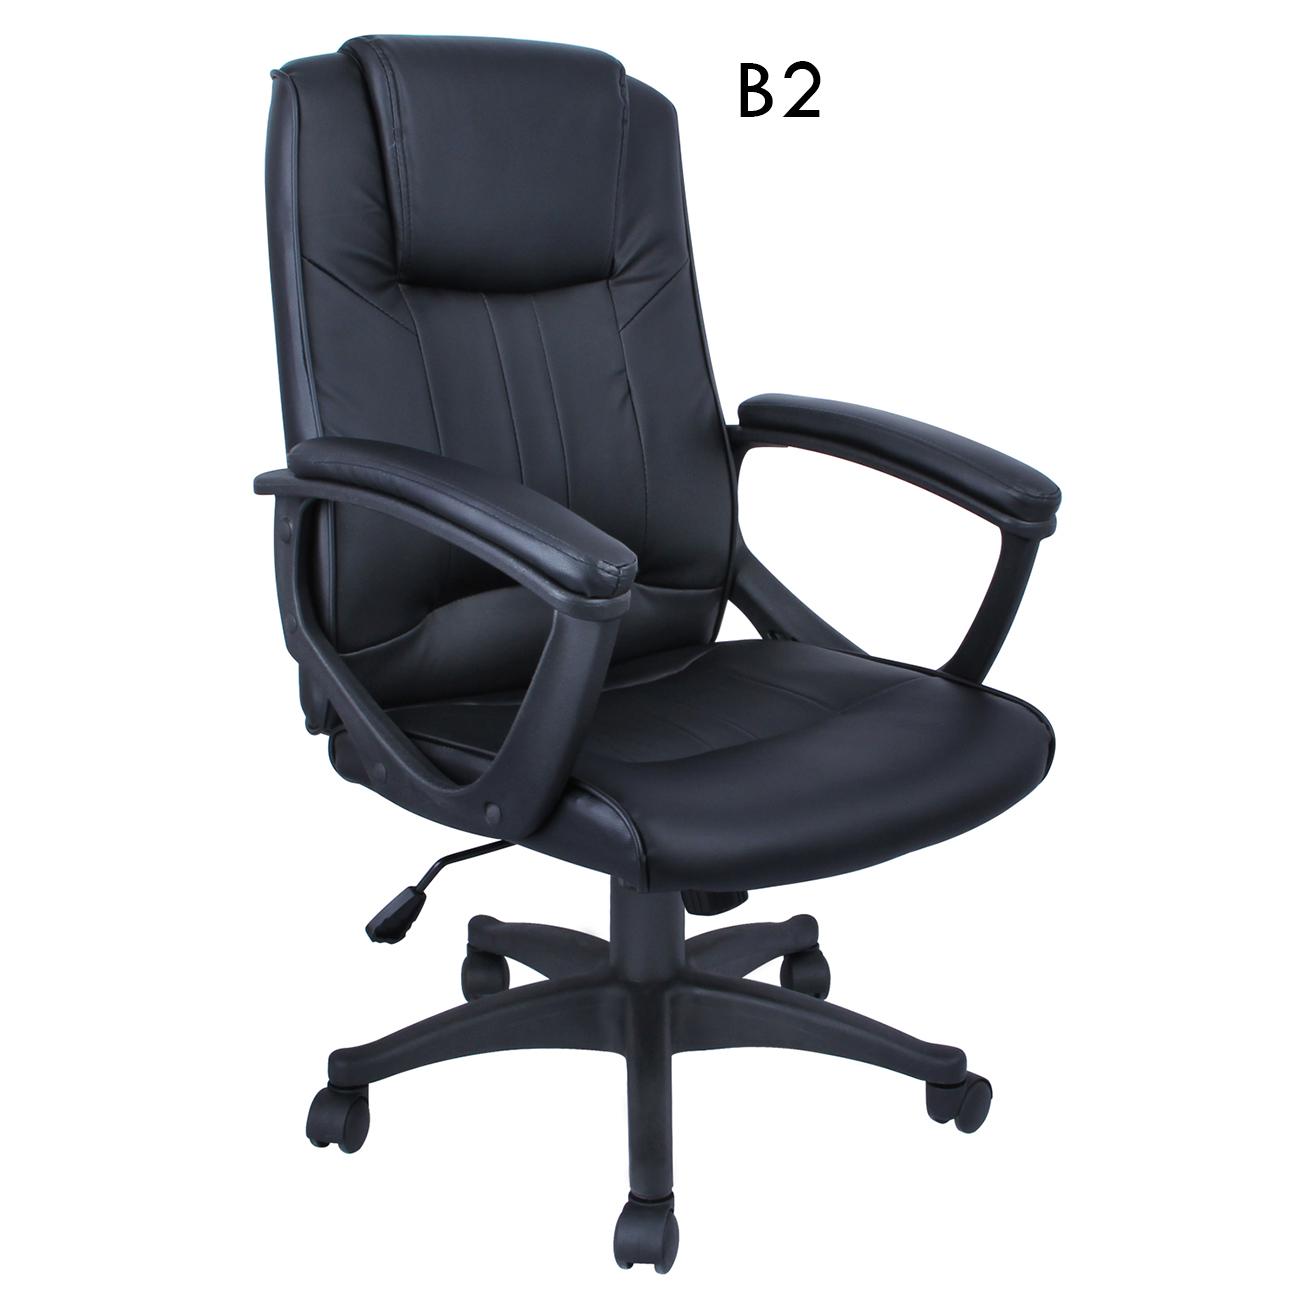 High back pu leather executive ergonomic office chair desk task computer black ebay - Ergo desk chairs ...